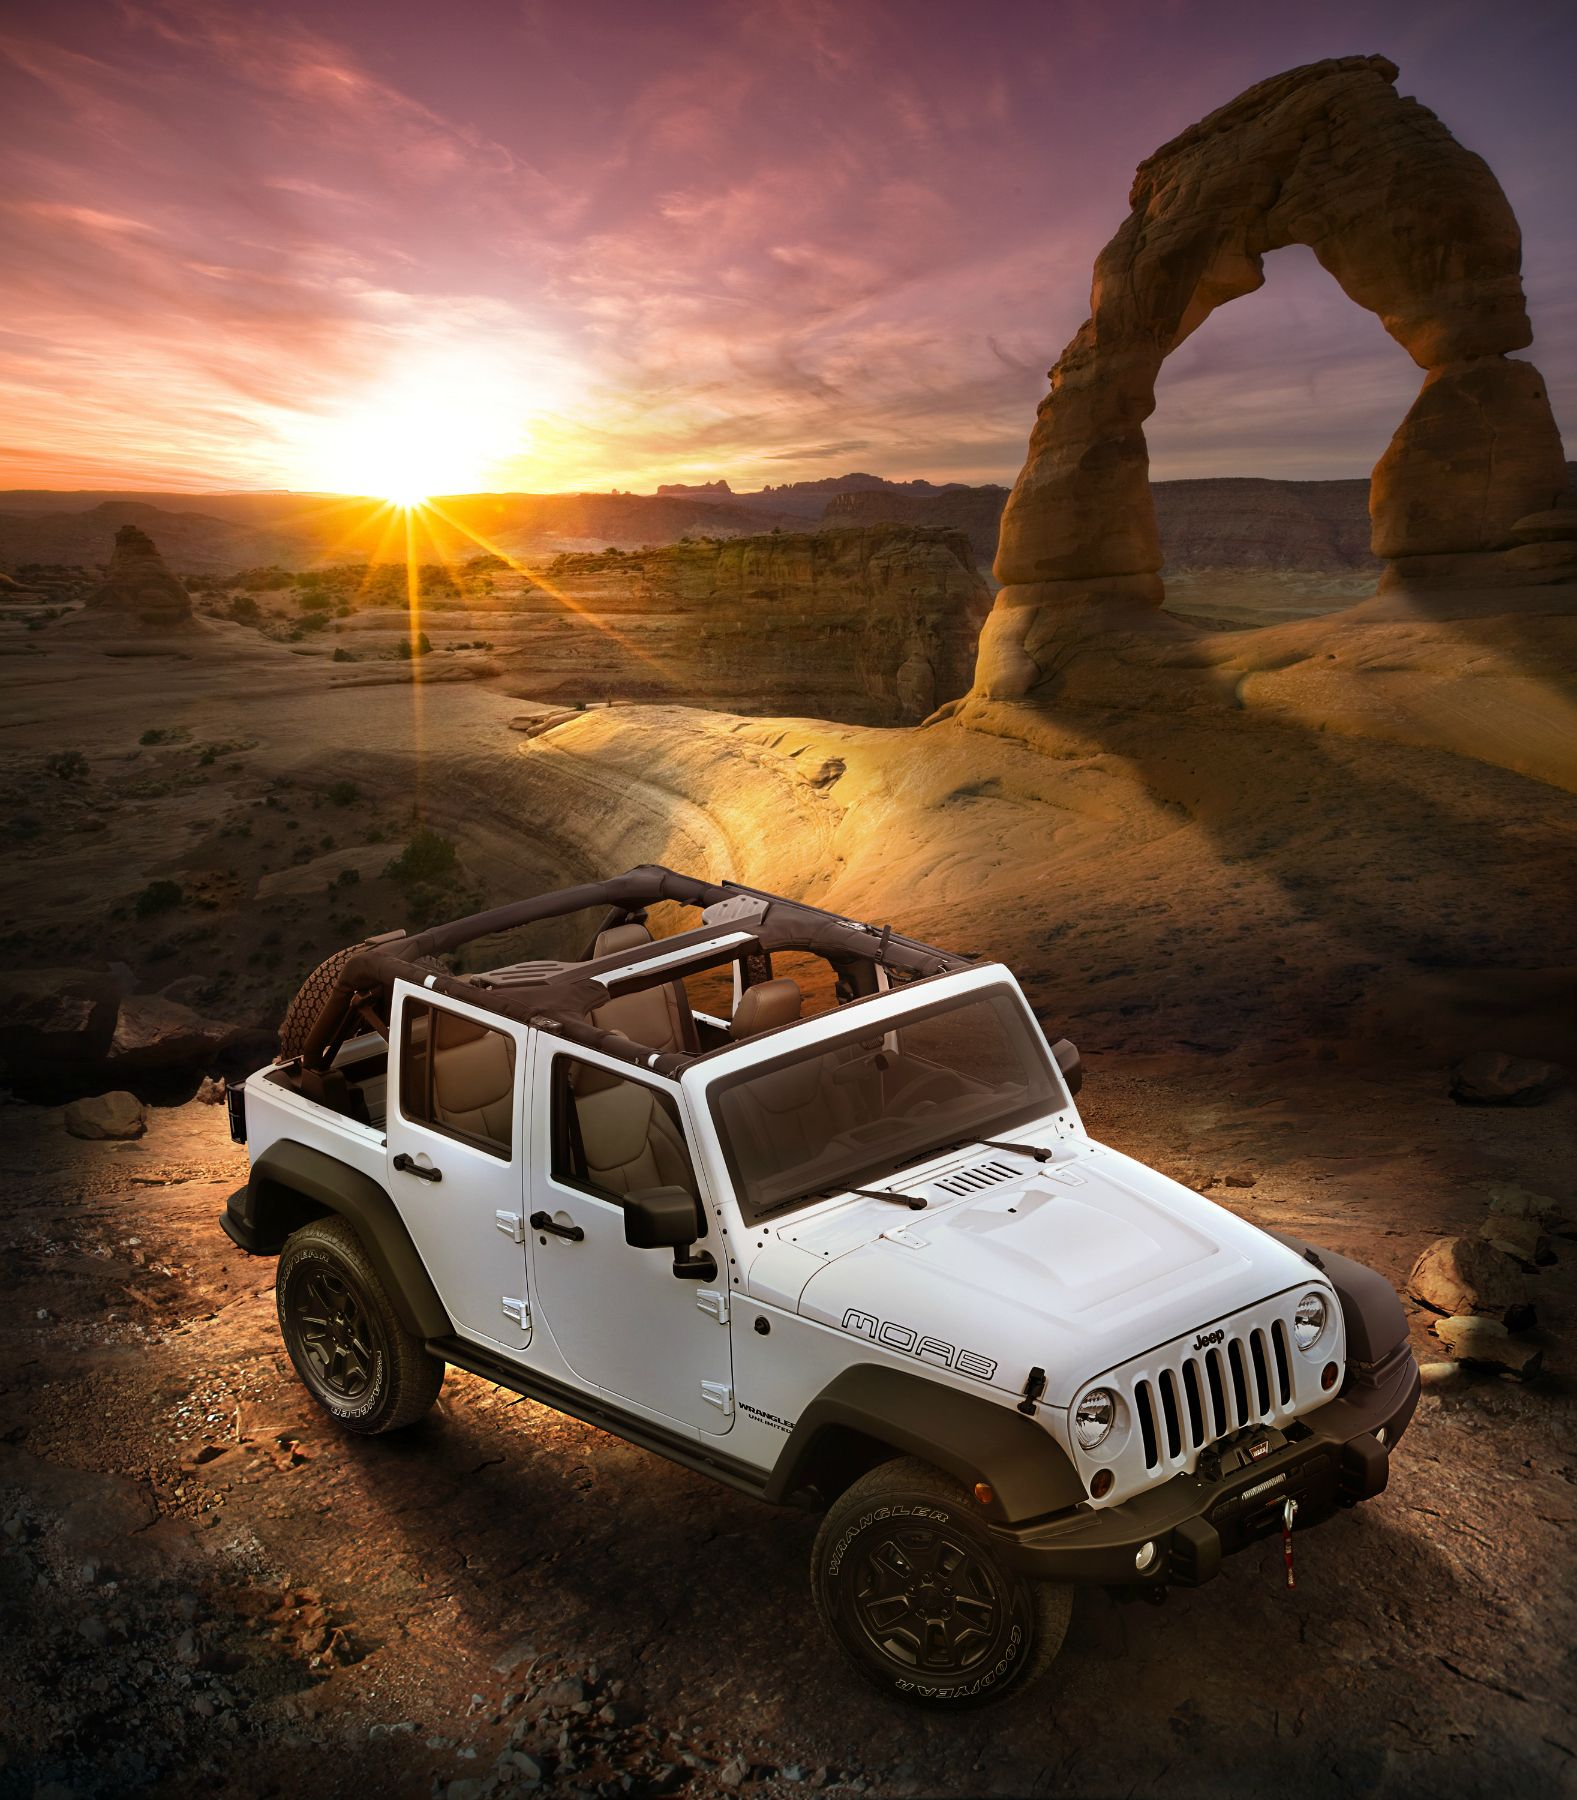 full jeep moab sunset fred martin superstore 3195 barber road barberton norton oh 44203 877 644. Black Bedroom Furniture Sets. Home Design Ideas